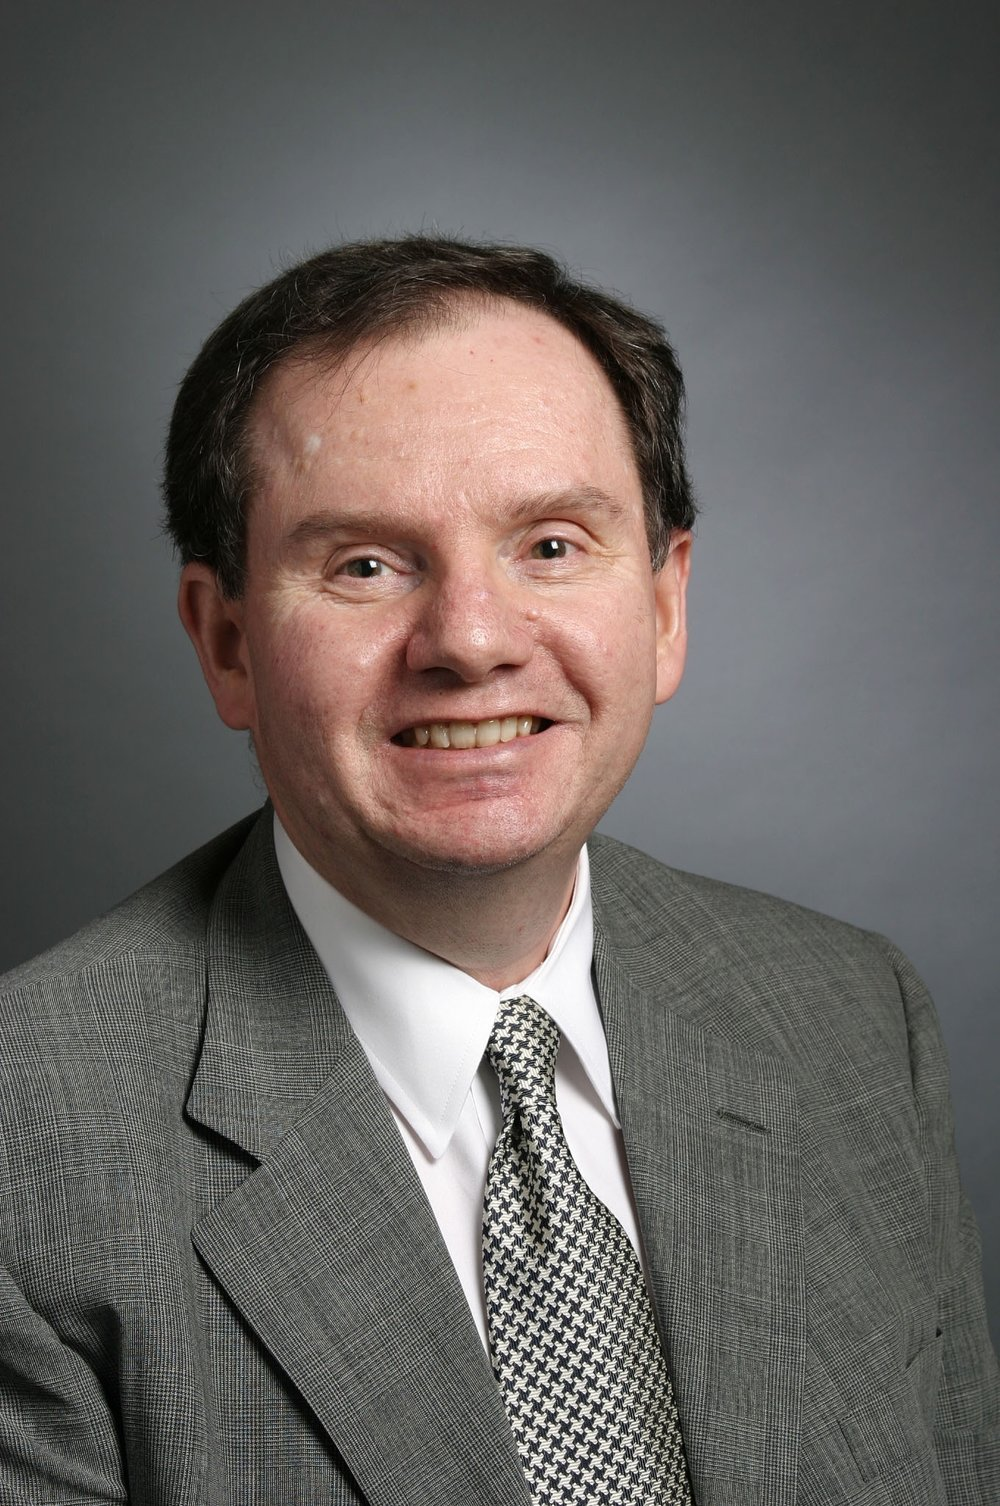 Dr. Robert M. Brill